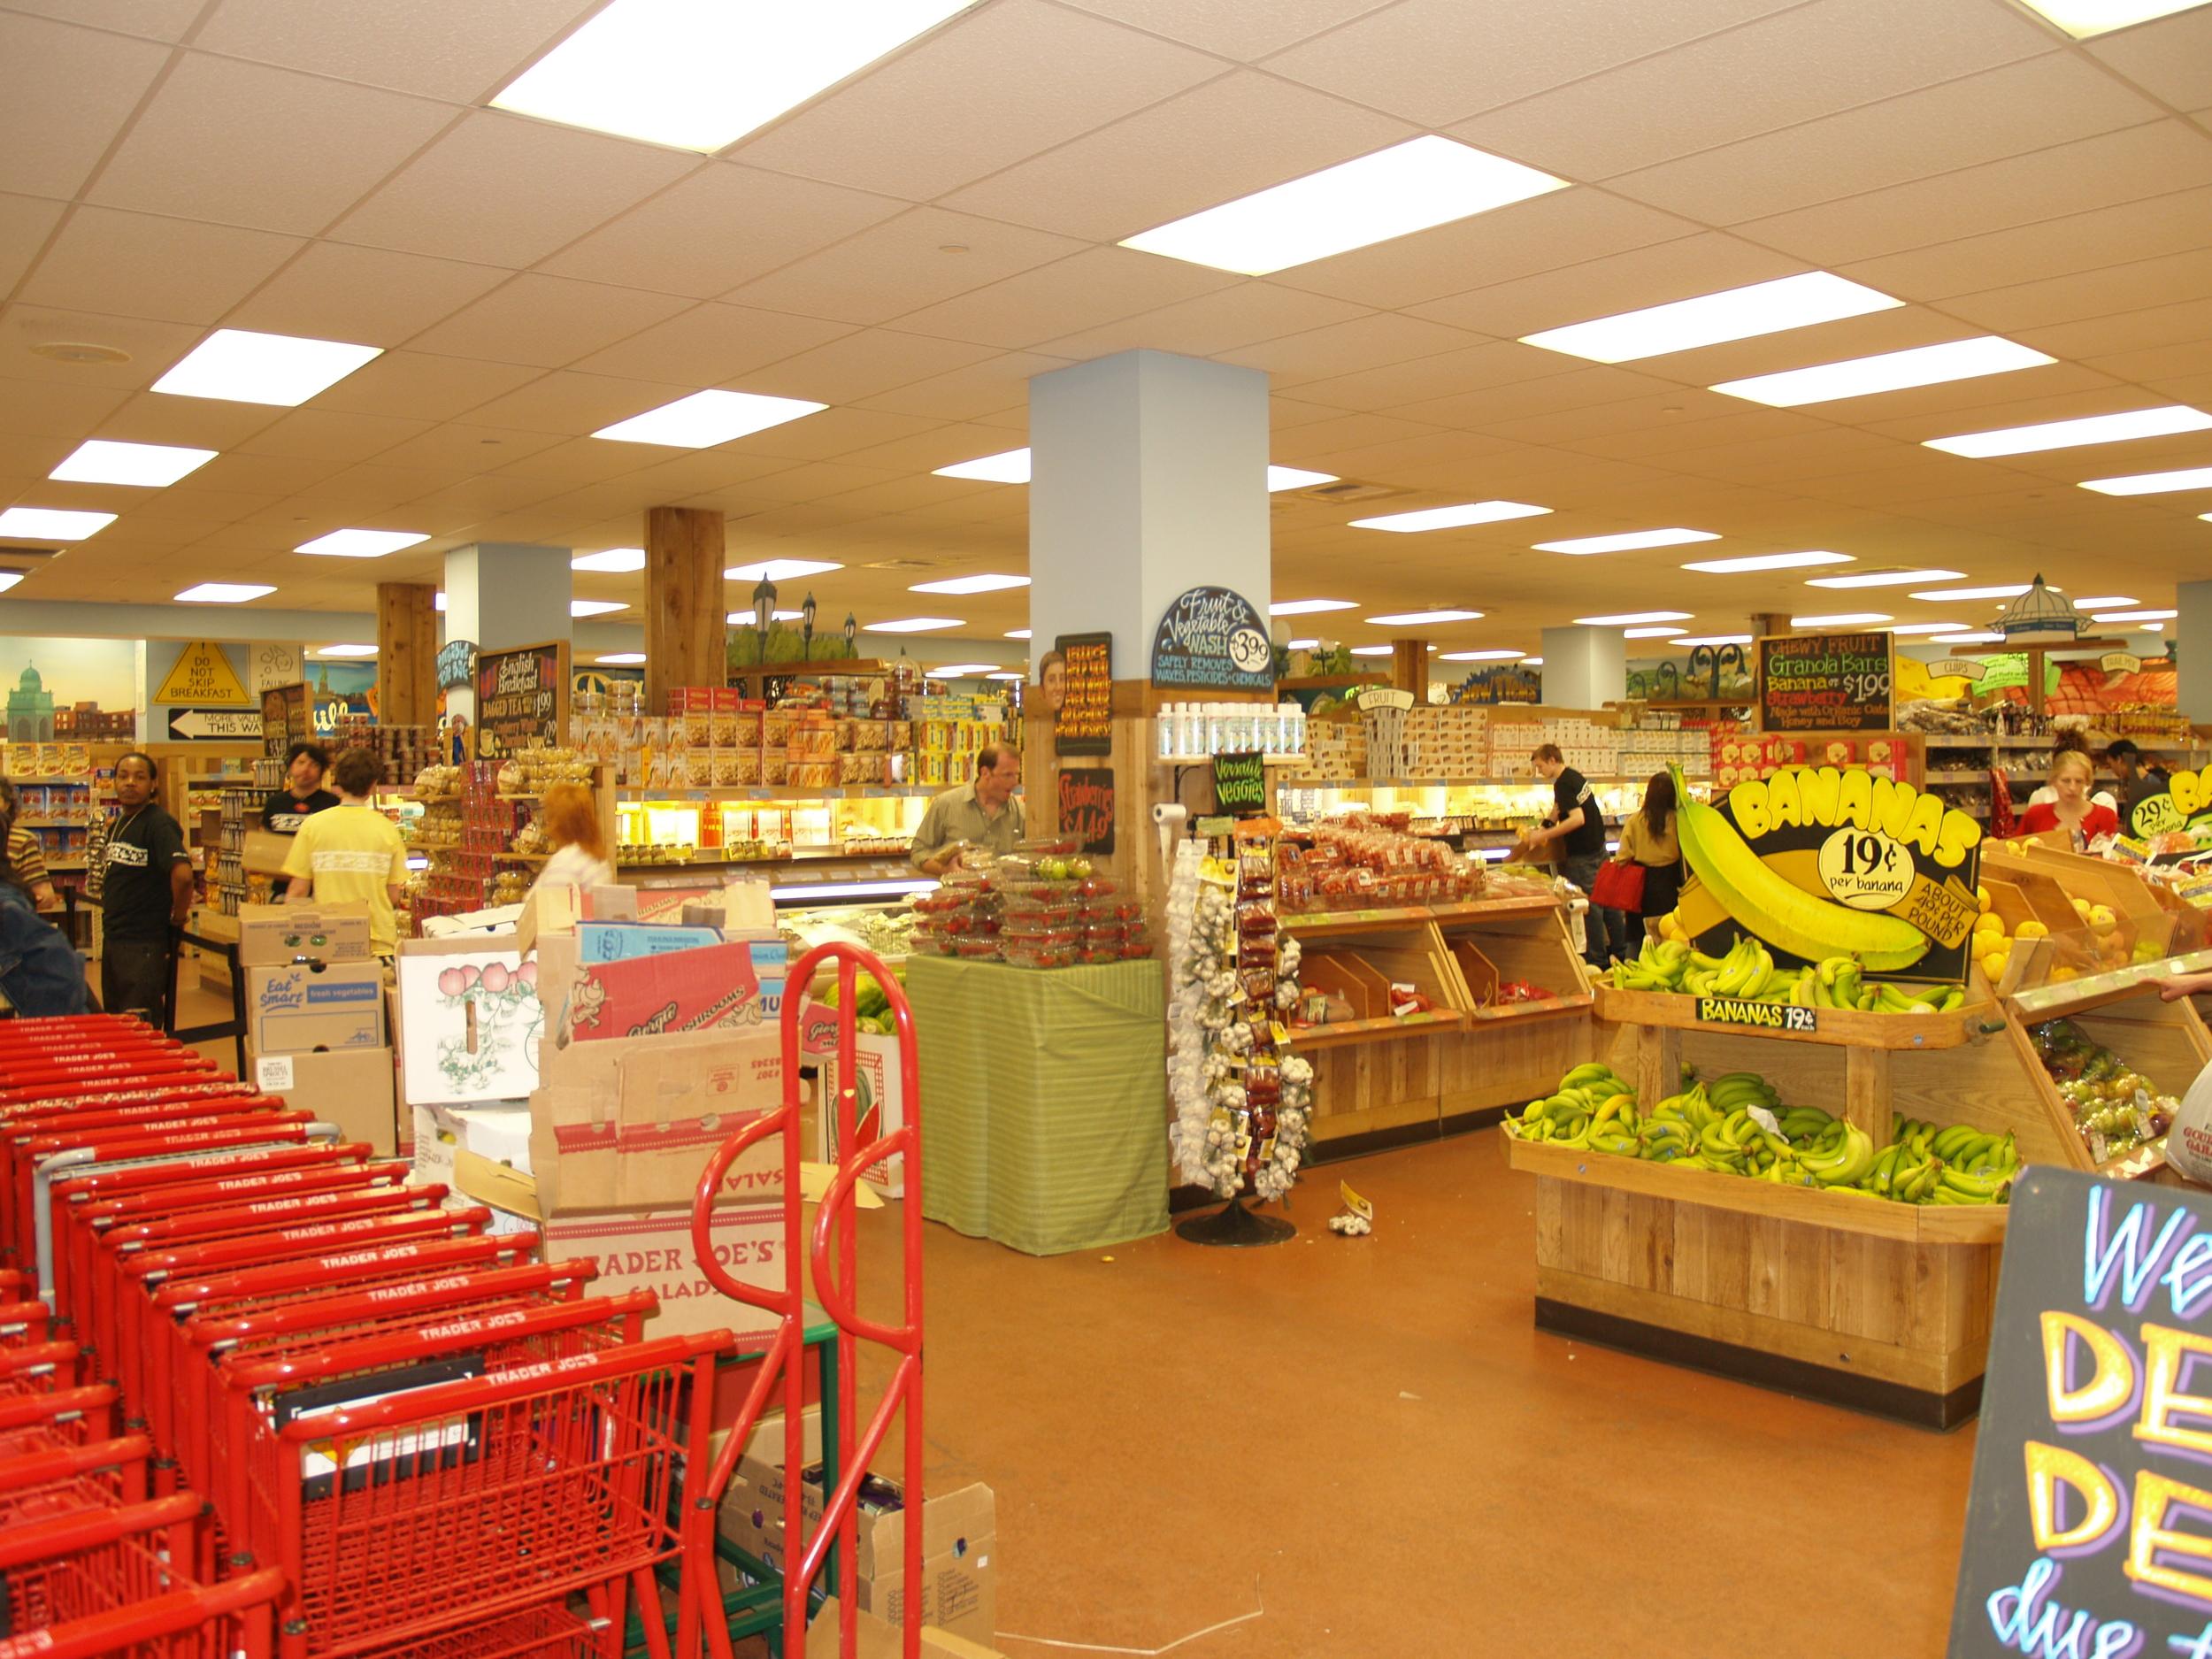 Image of Trader Joe's, from  Wikimedia